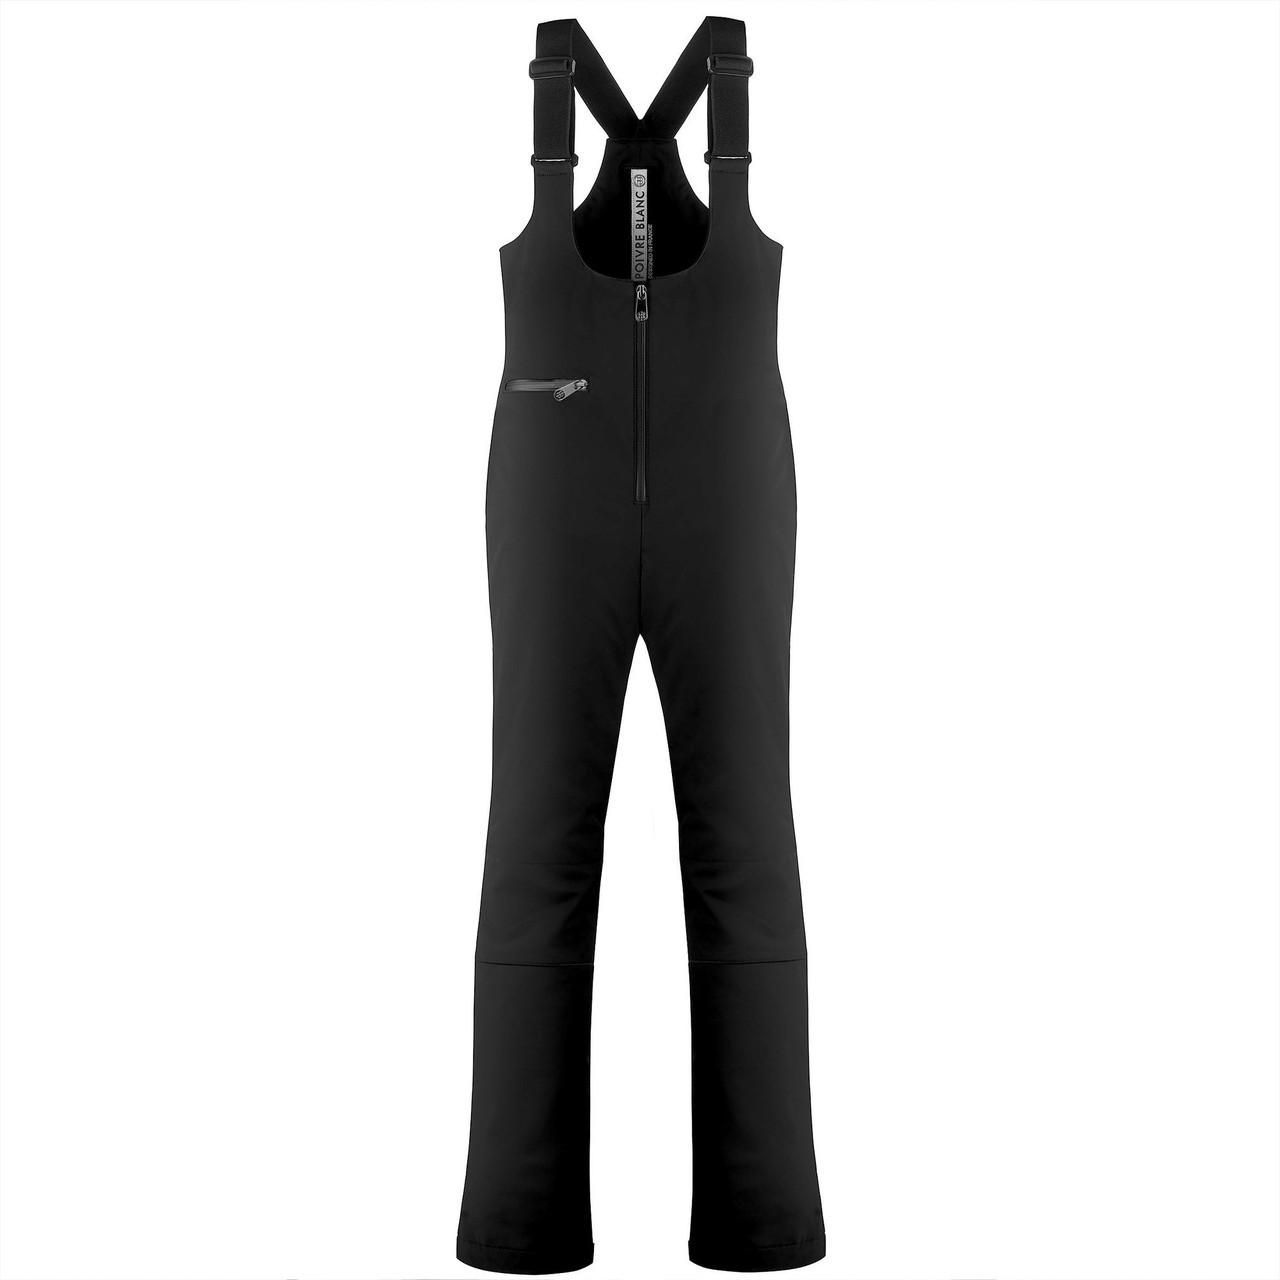 Горнолыжные штаны WO Strech Ski Bib pant Black р. XS